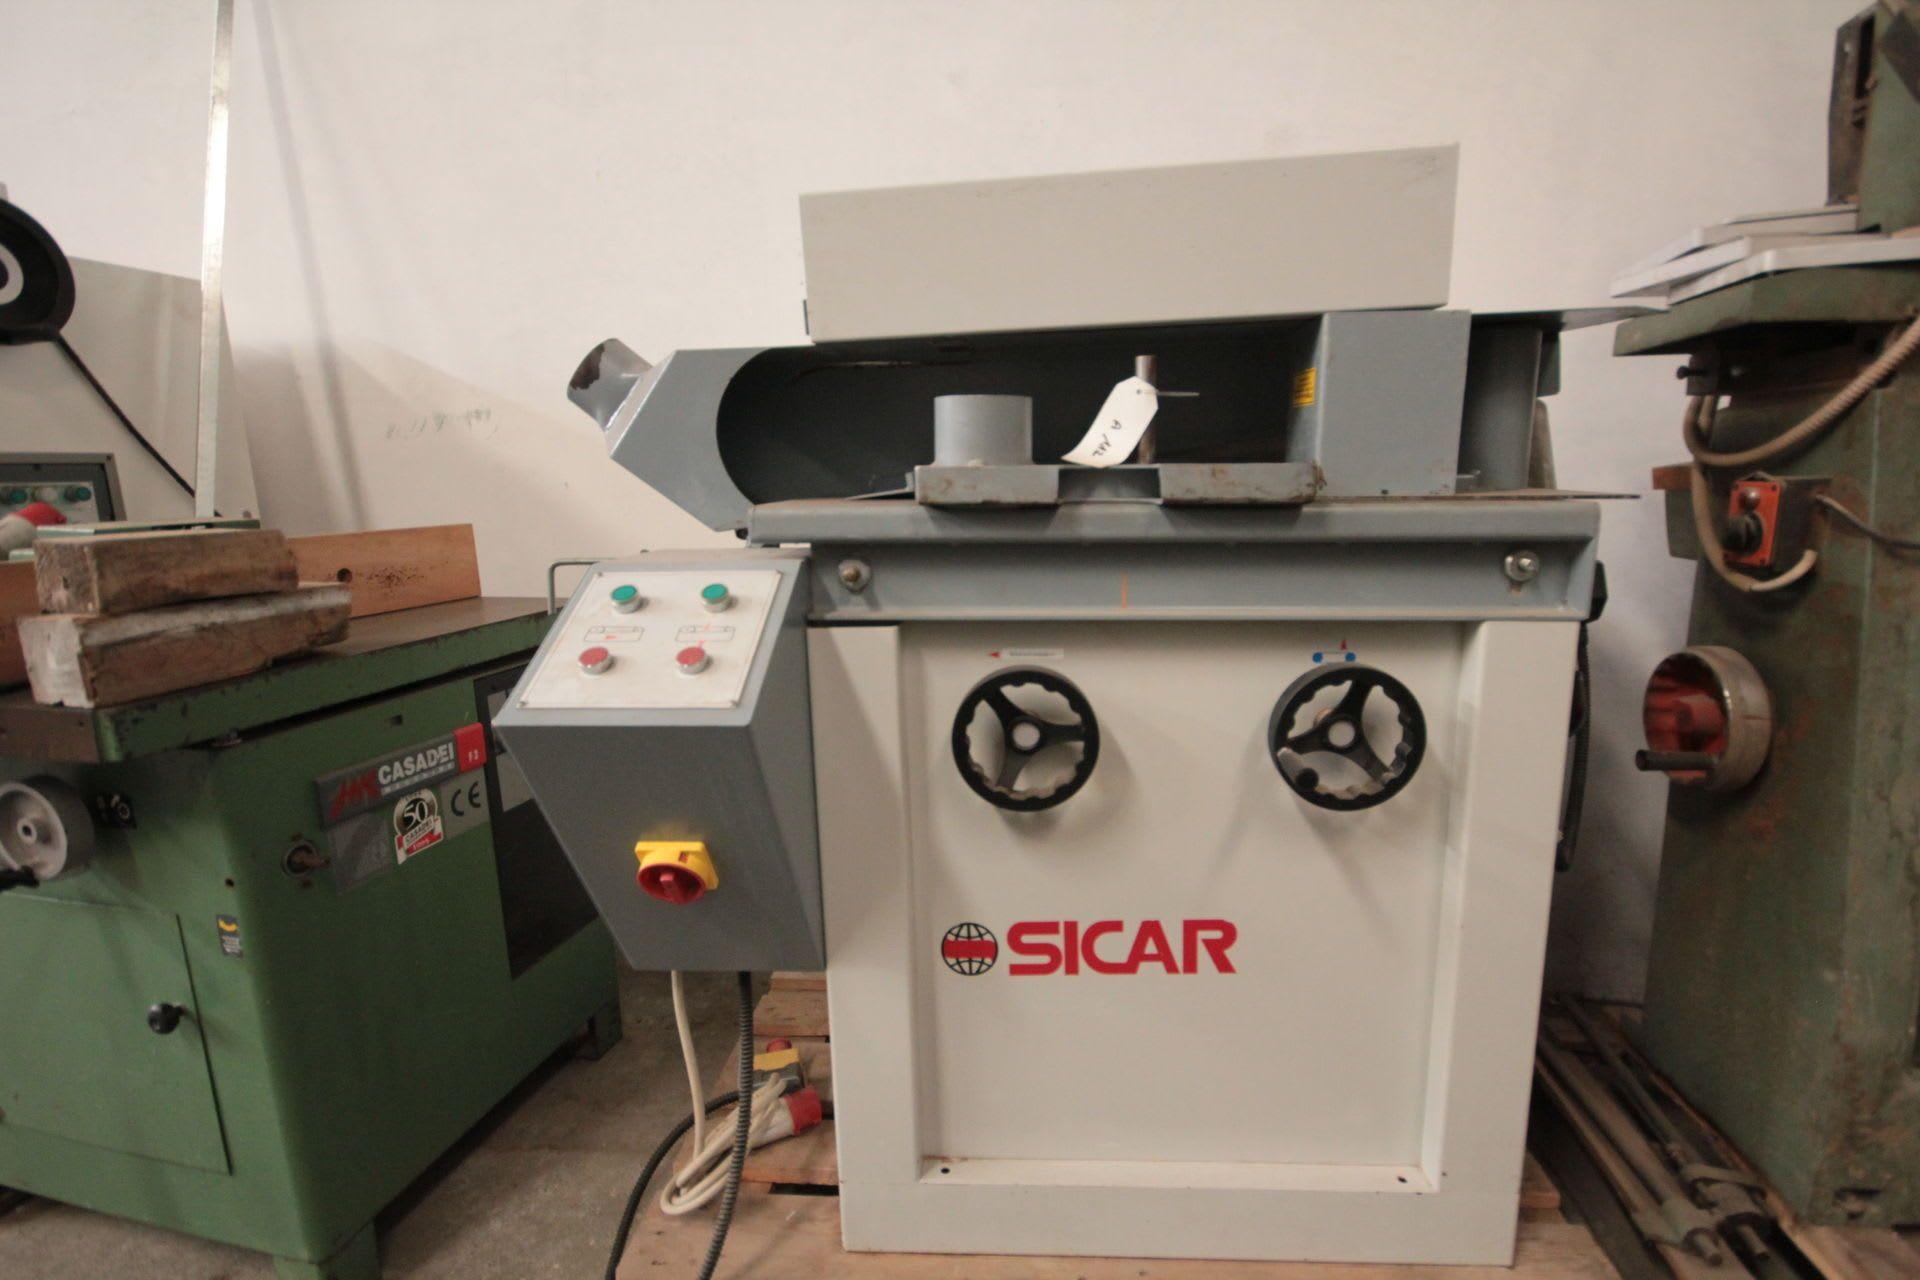 SICAR SL 120 Bandschleifmaschine